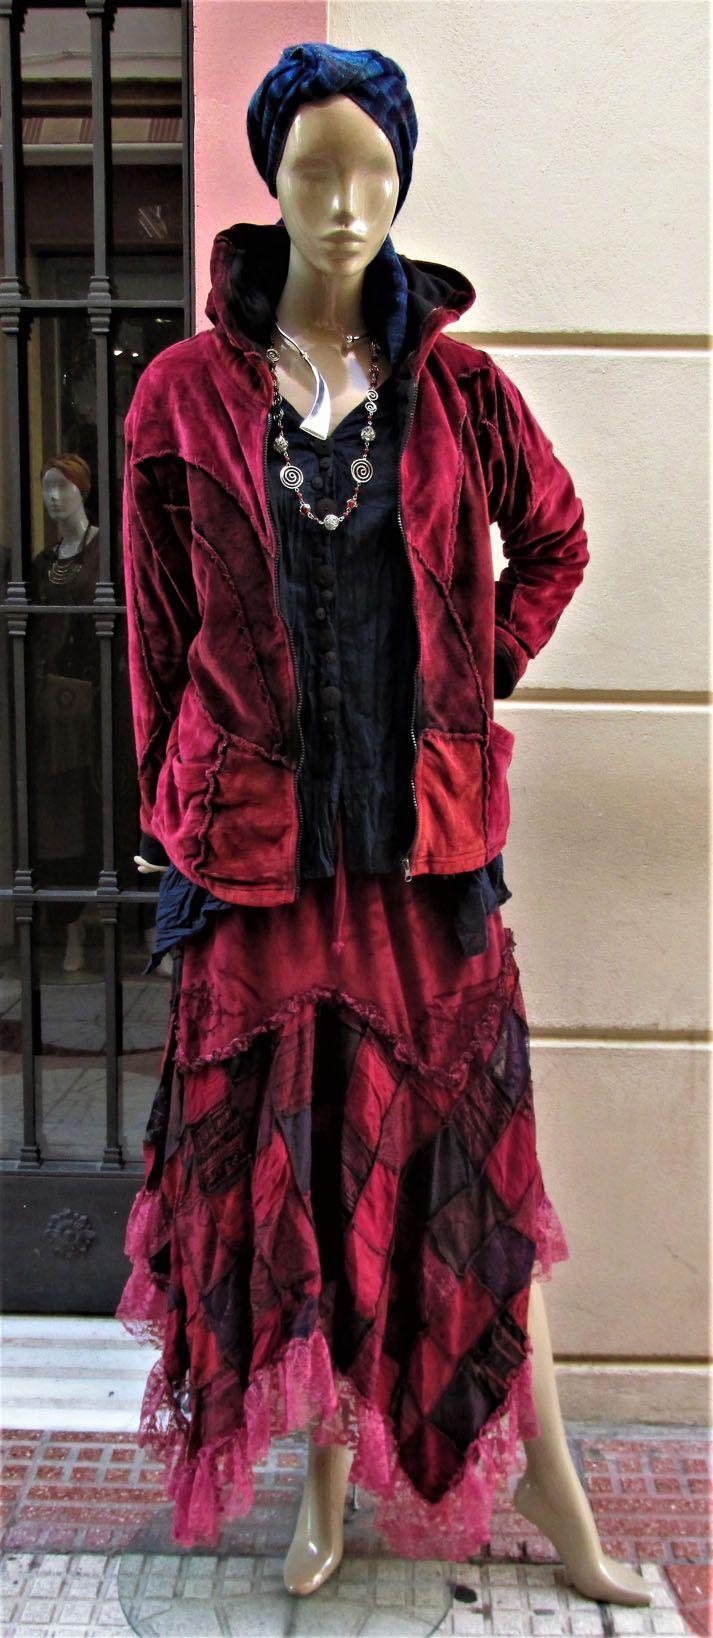 Chaqueta de Terciopelo PatchWork con Forro Polar Falda de Terciopelo con Encaje y Patch Sofisticación, Seducción y Glamour #moda #coleccion #otoño #coachella#coachellaoutfit#invierno #bohemian #styles #estilo #bohemio #bohostyles #fashionstyle #bohochic #glamour #boho #outfits #outfitideas #moda #estilo #modamujer #modafemenina #online #onlineshop www.modabagus.com